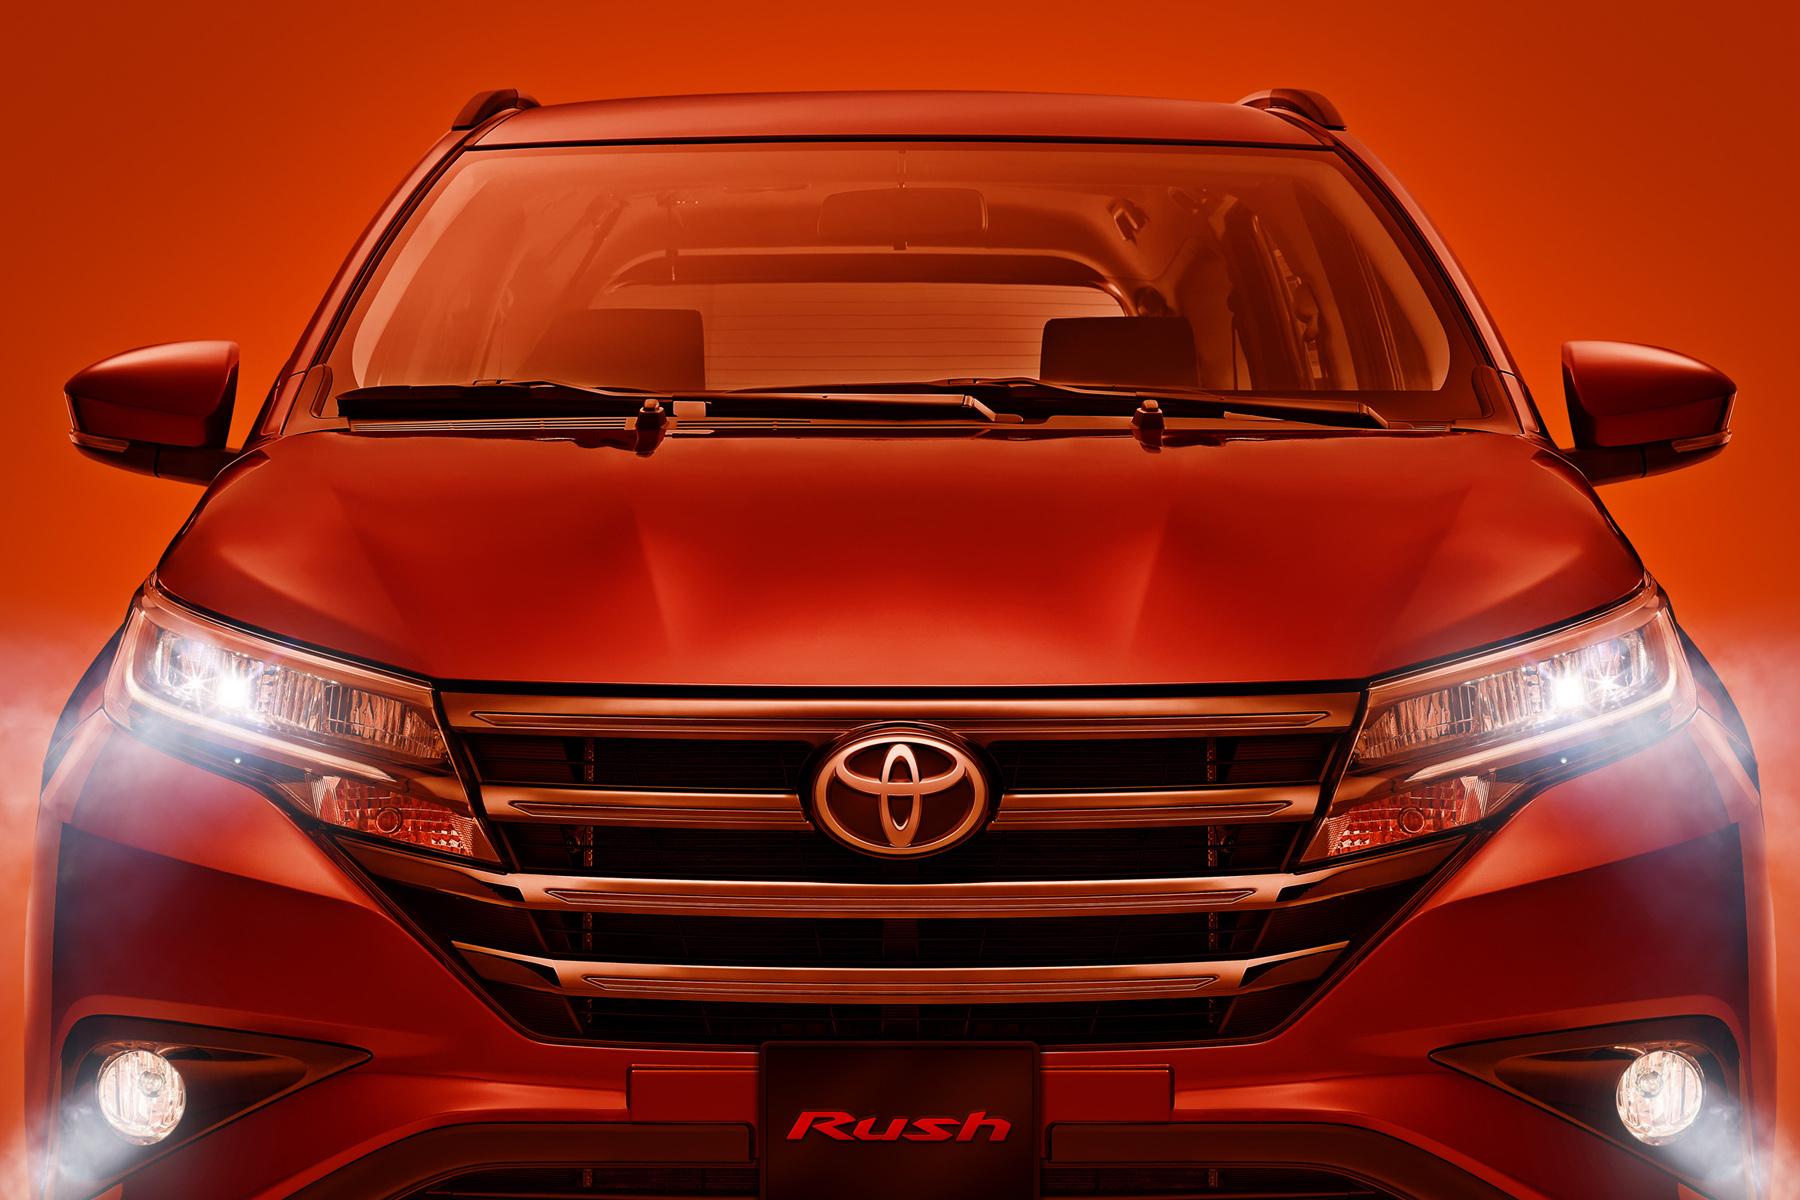 Toyota Rush Detail_0003_Rush_detail_0003_Layer 5 copy.jpg